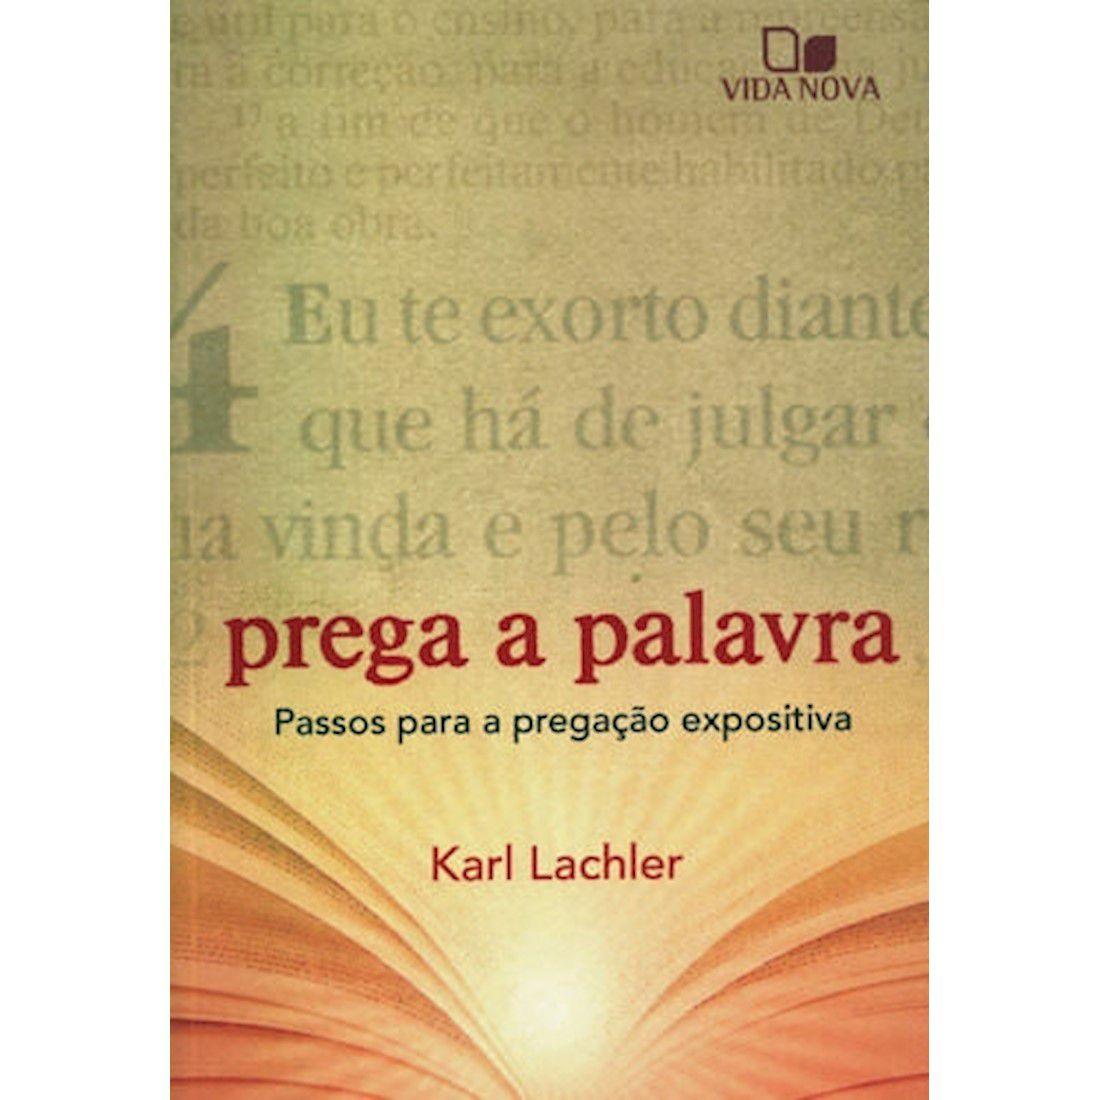 Livro Prega a Palavra